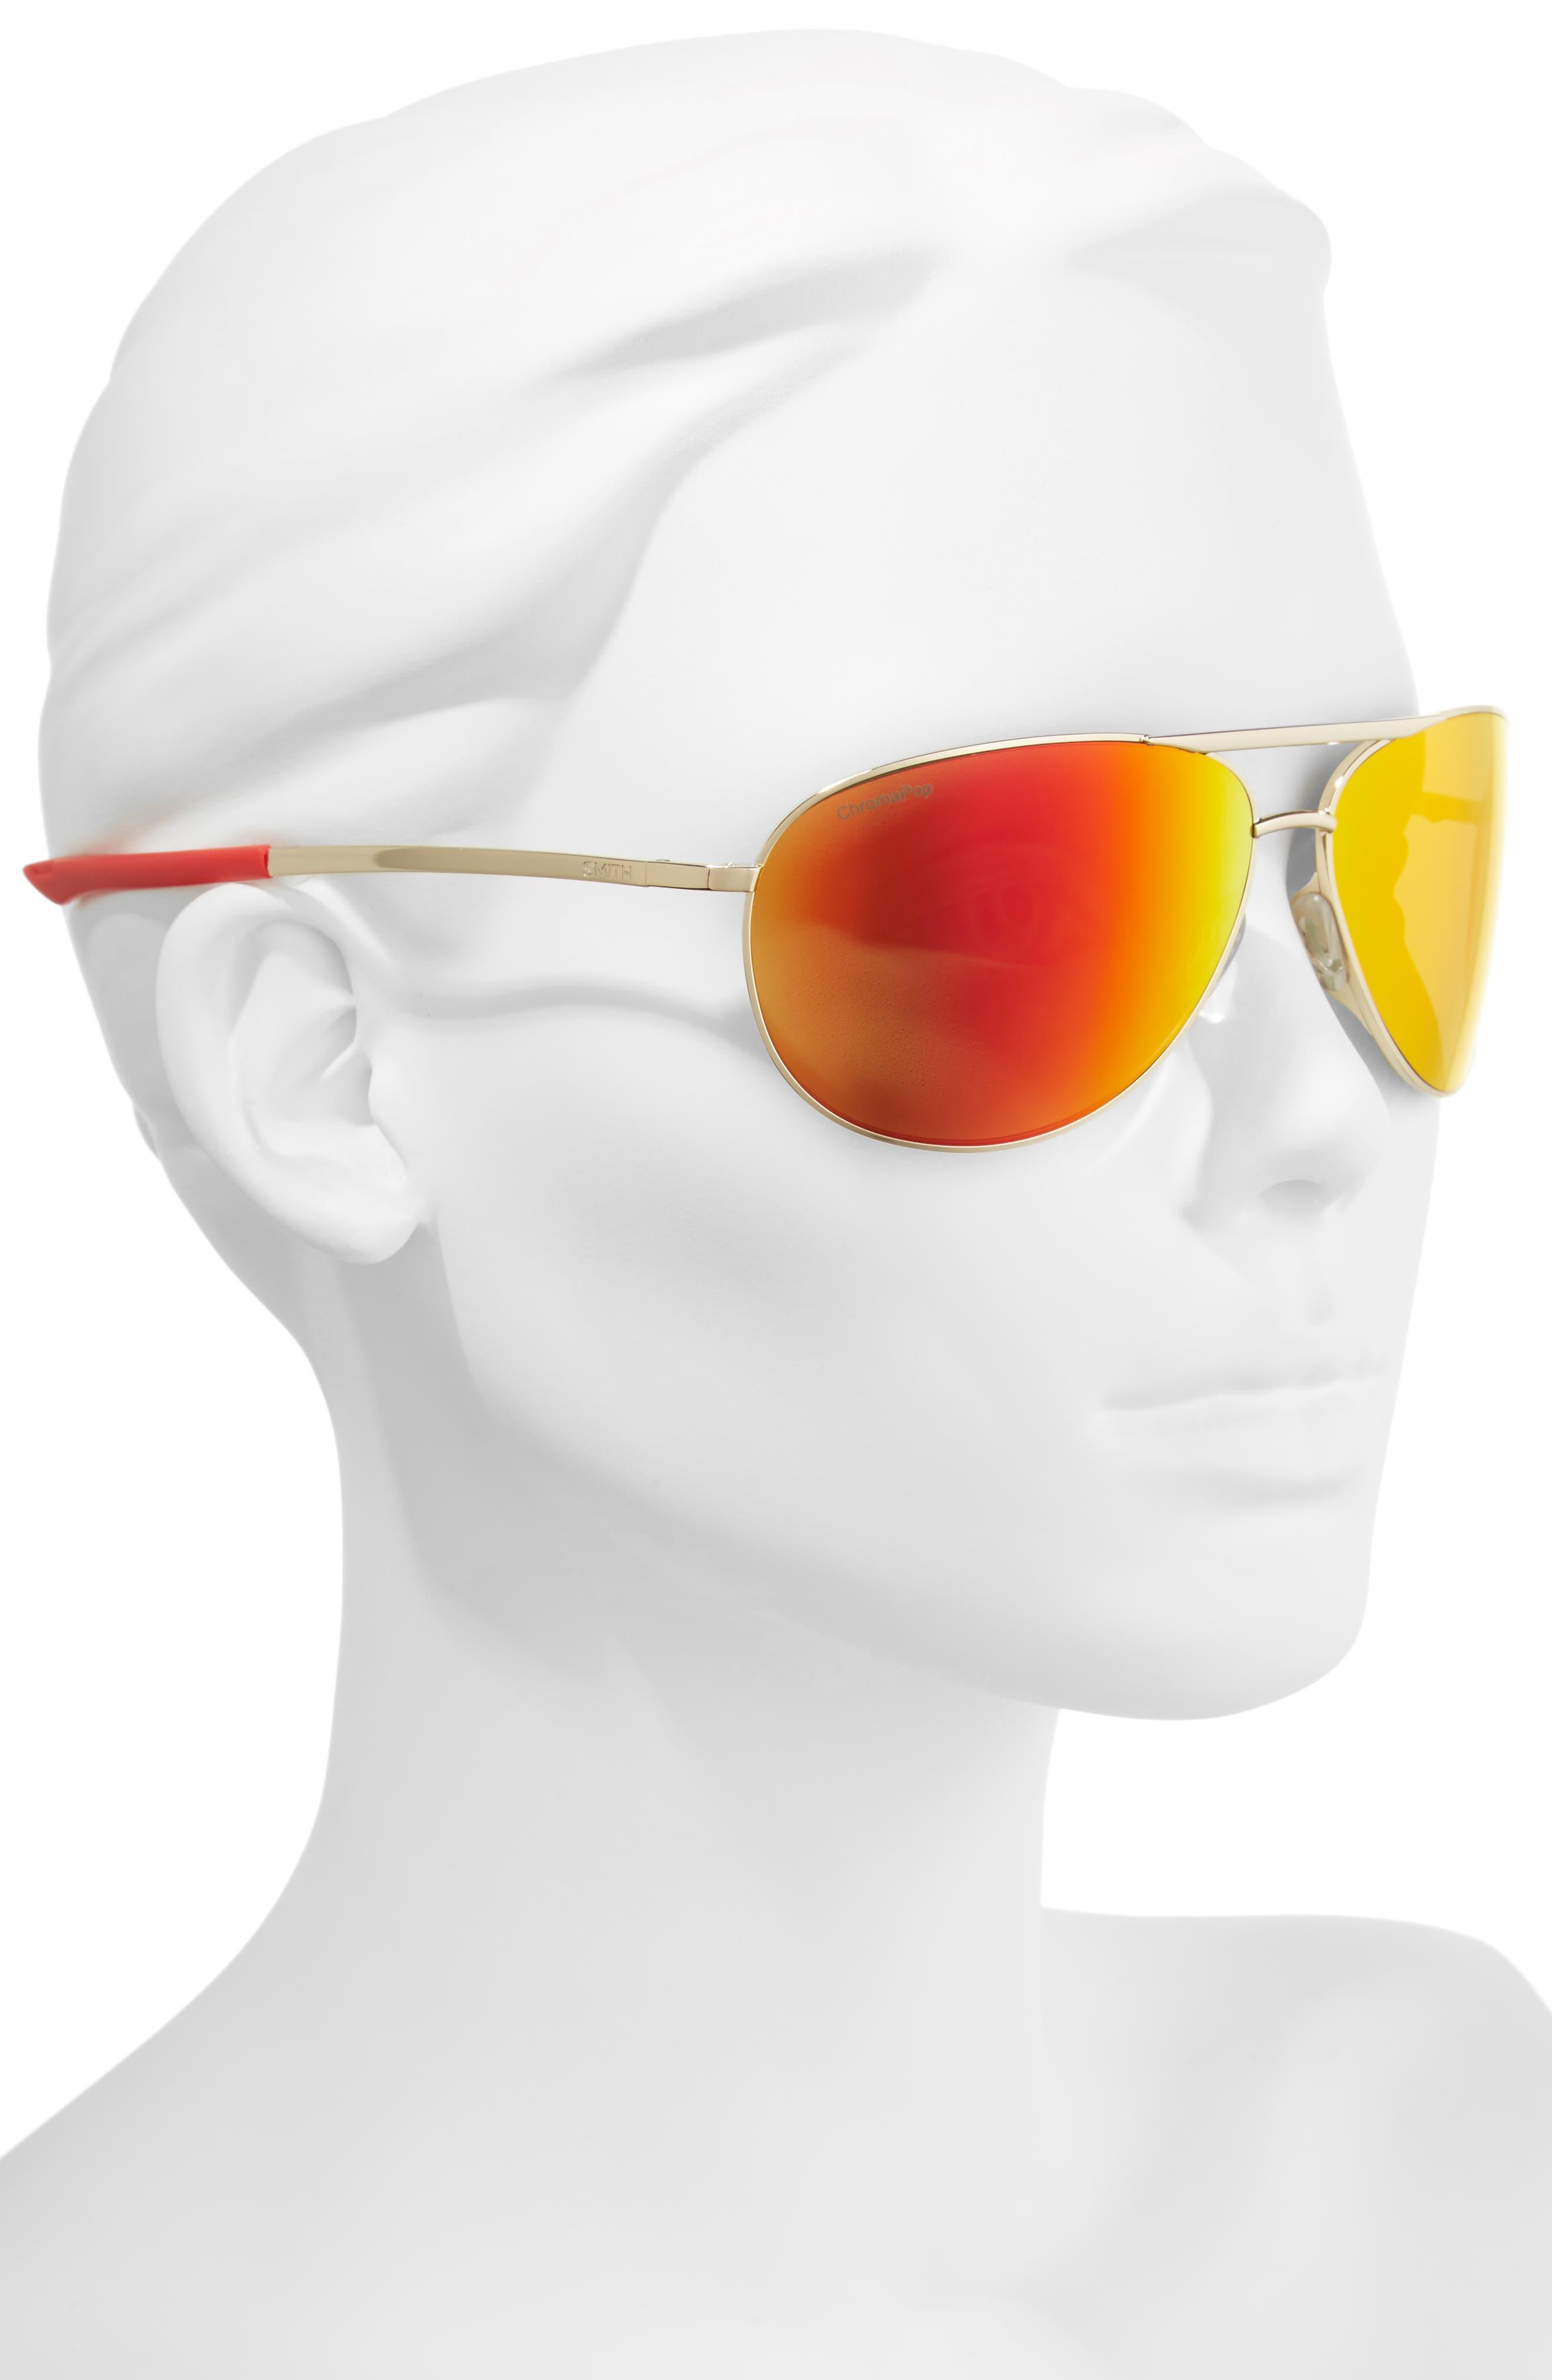 Alternate Image 2  - Smith Serpico 2 65mm Mirrored ChromaPop™ Polarized Aviator Sunglasses